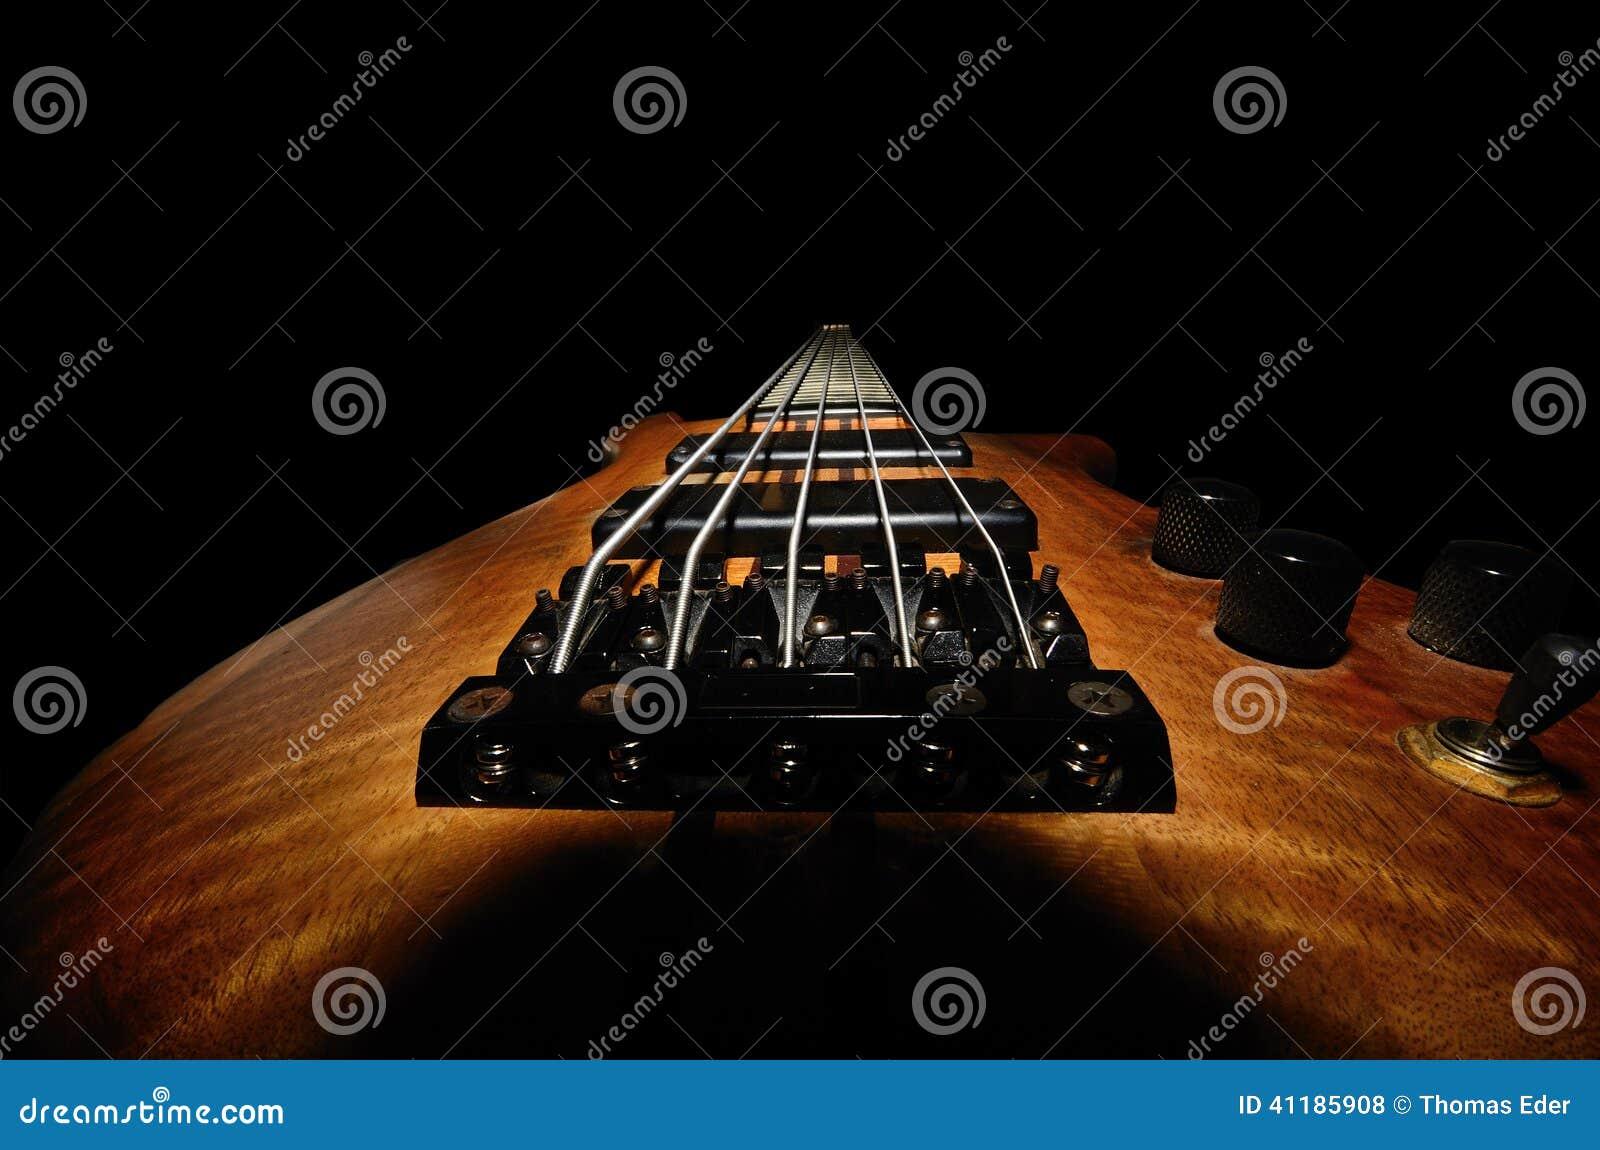 guitar wallpaper behind glass - photo #28